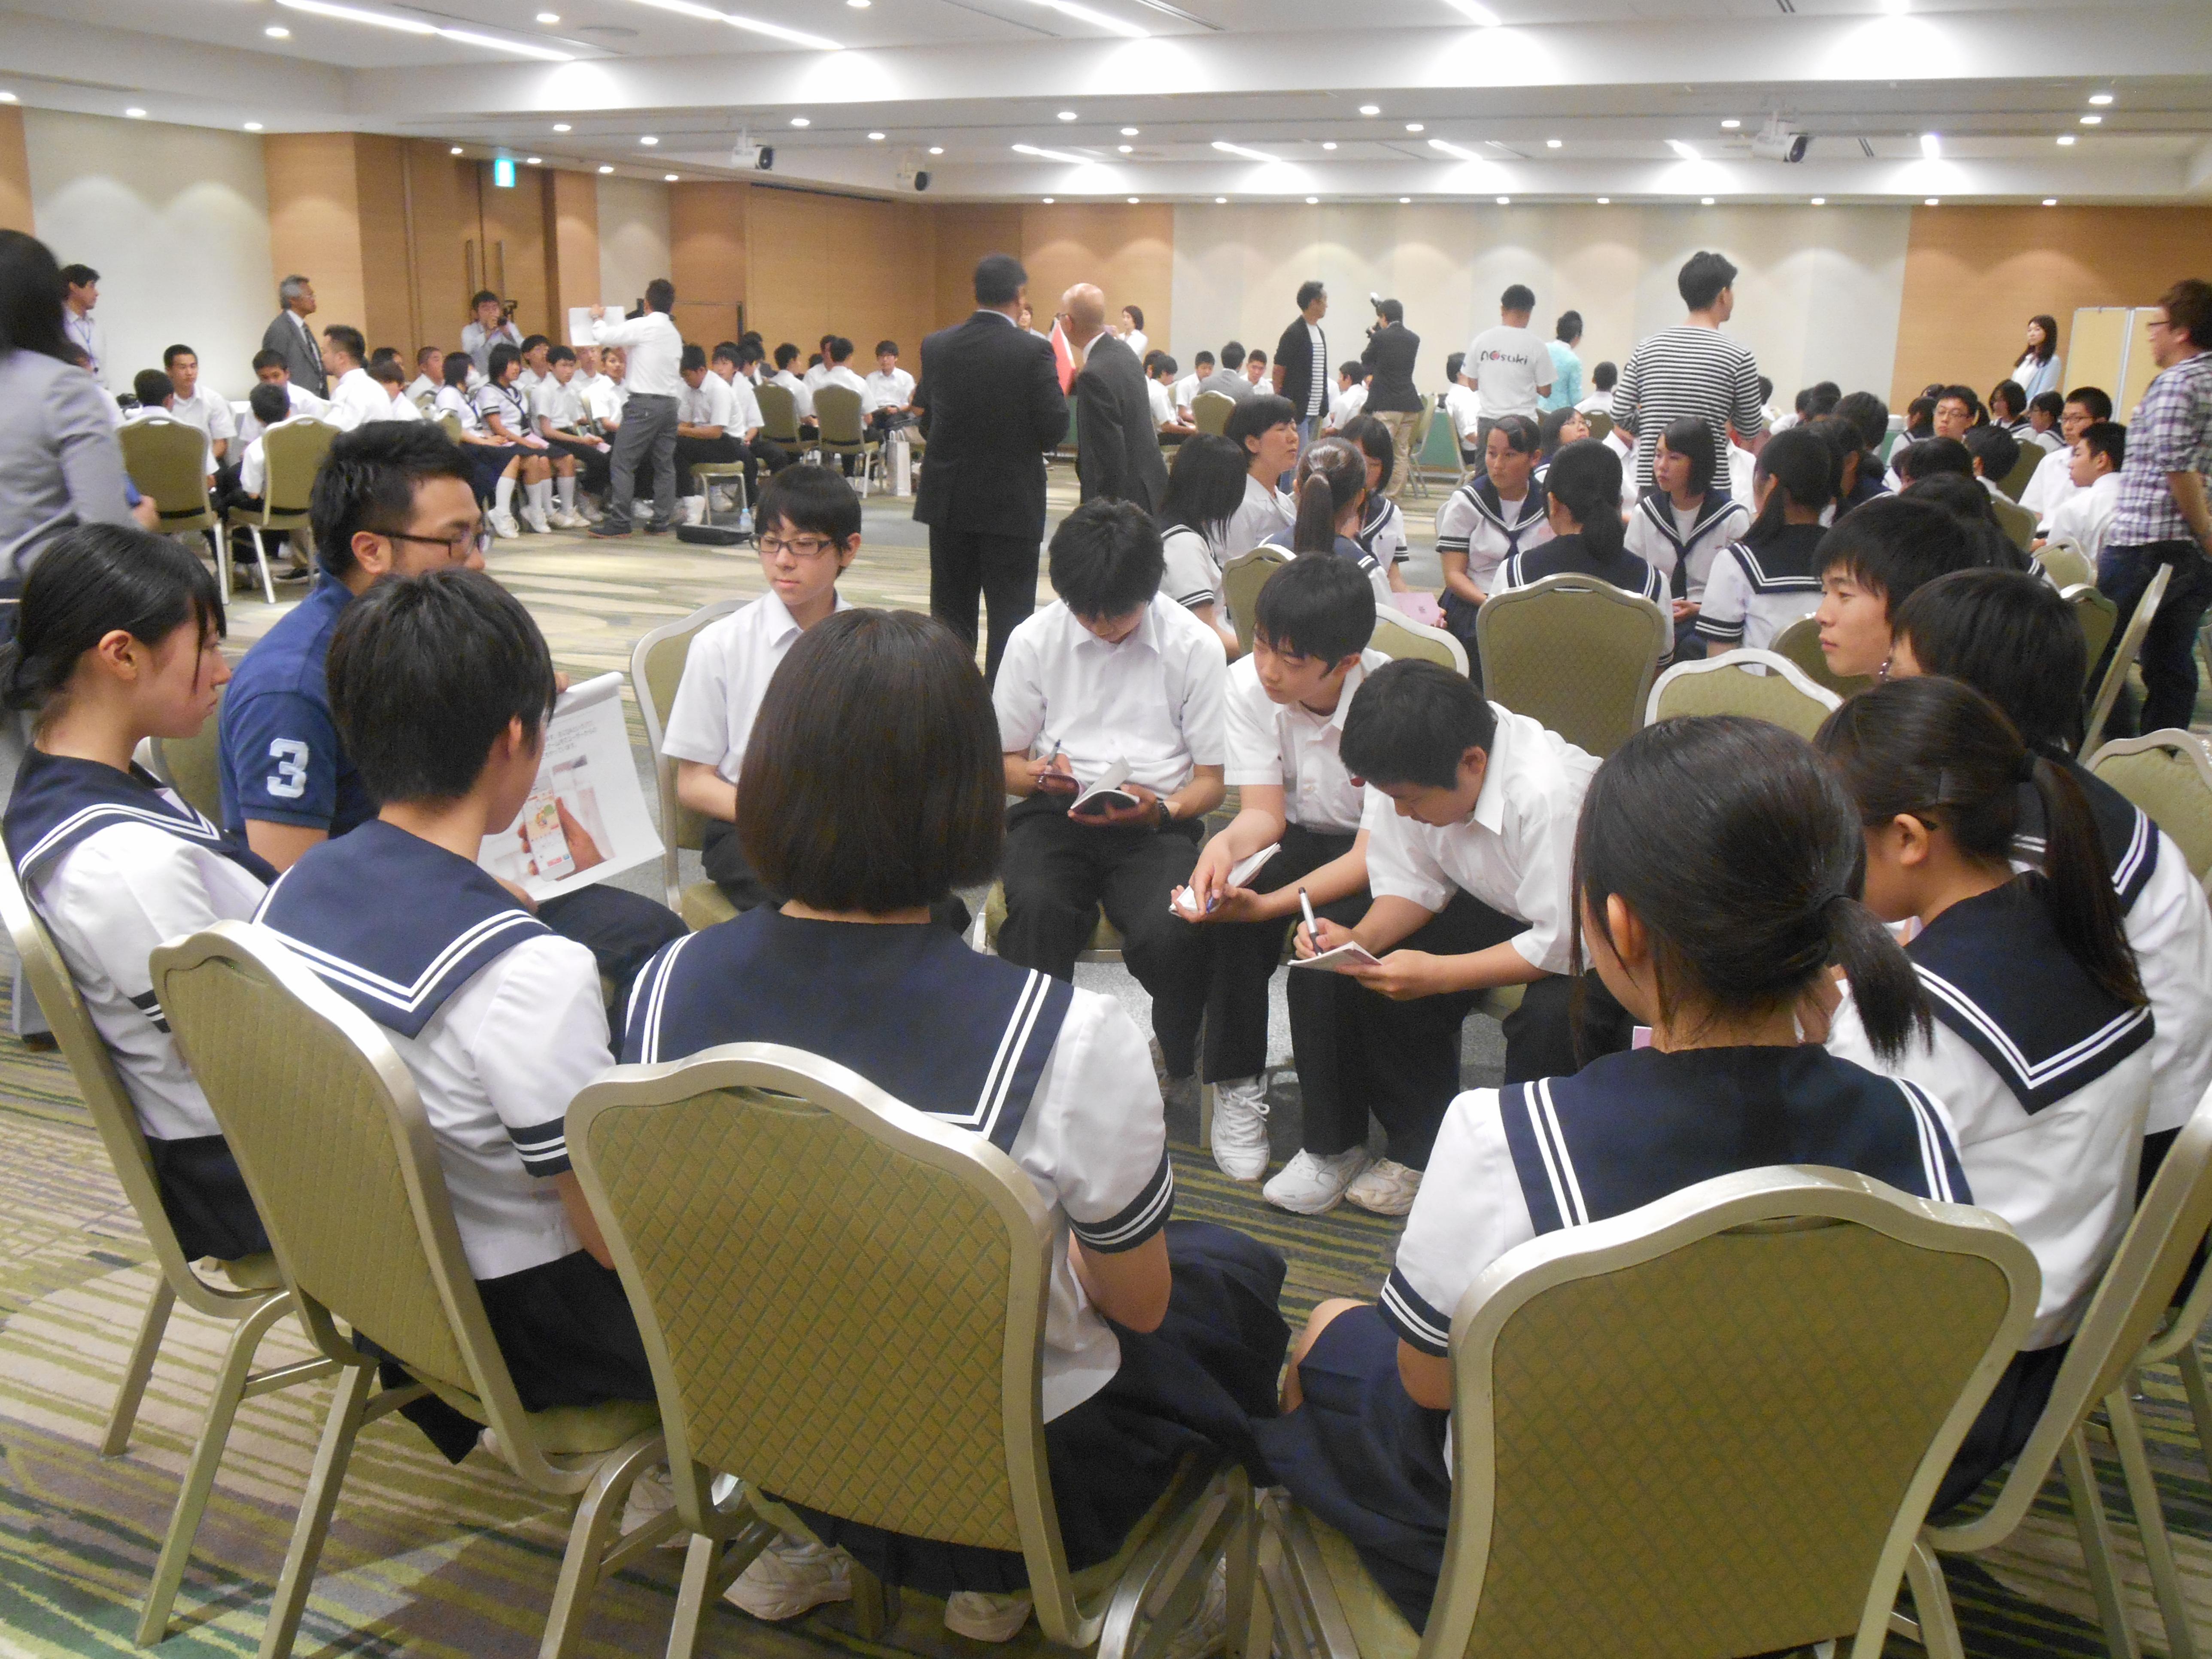 DSCN4409 - AOsuki主催:青森市内の中学校(修学旅行)に夢を与える時間